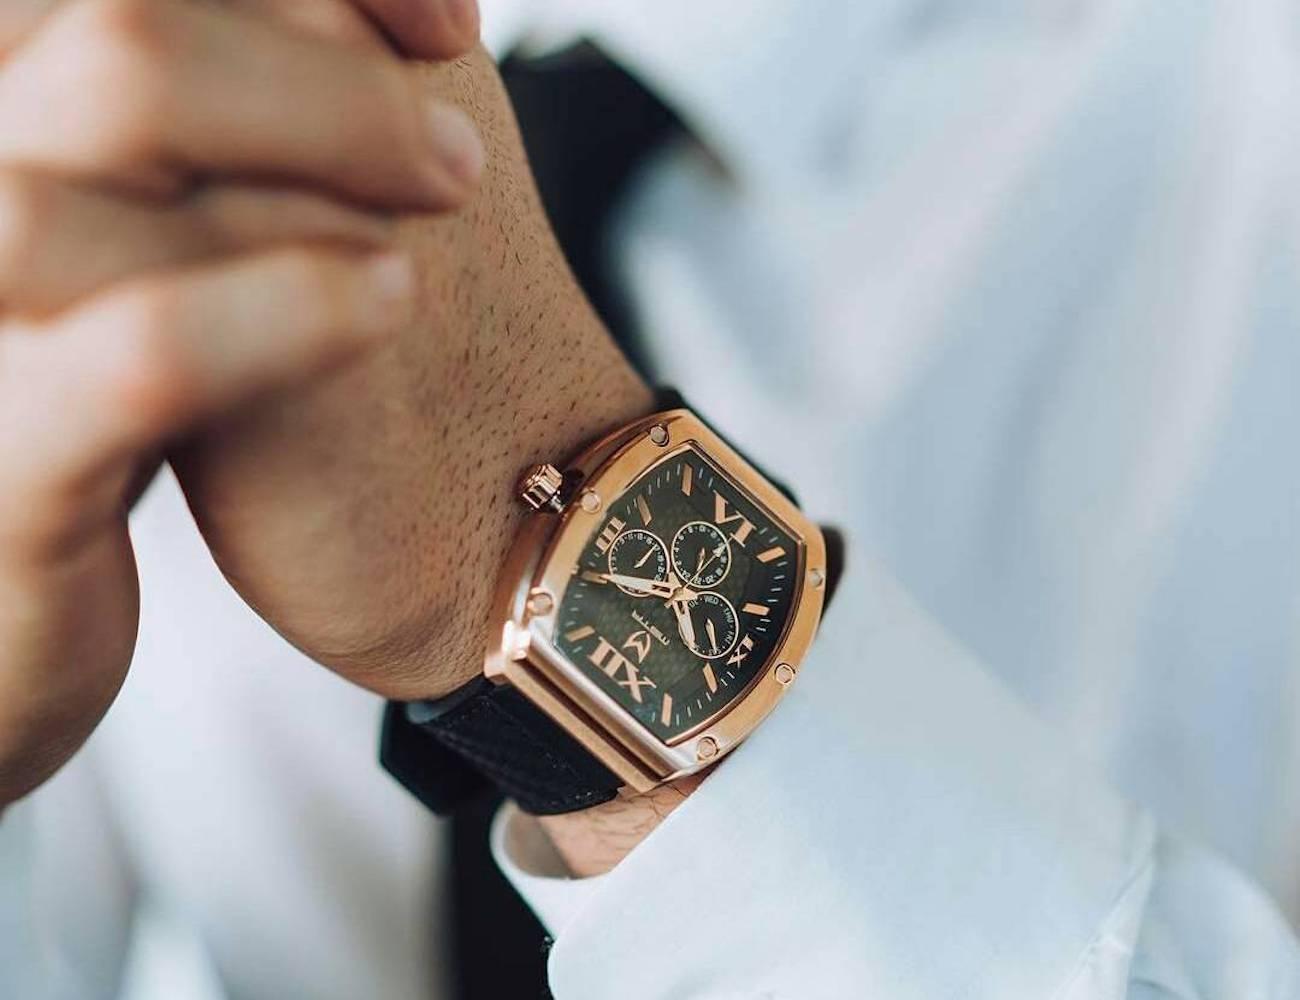 MSTR Major Sophisticated Watch